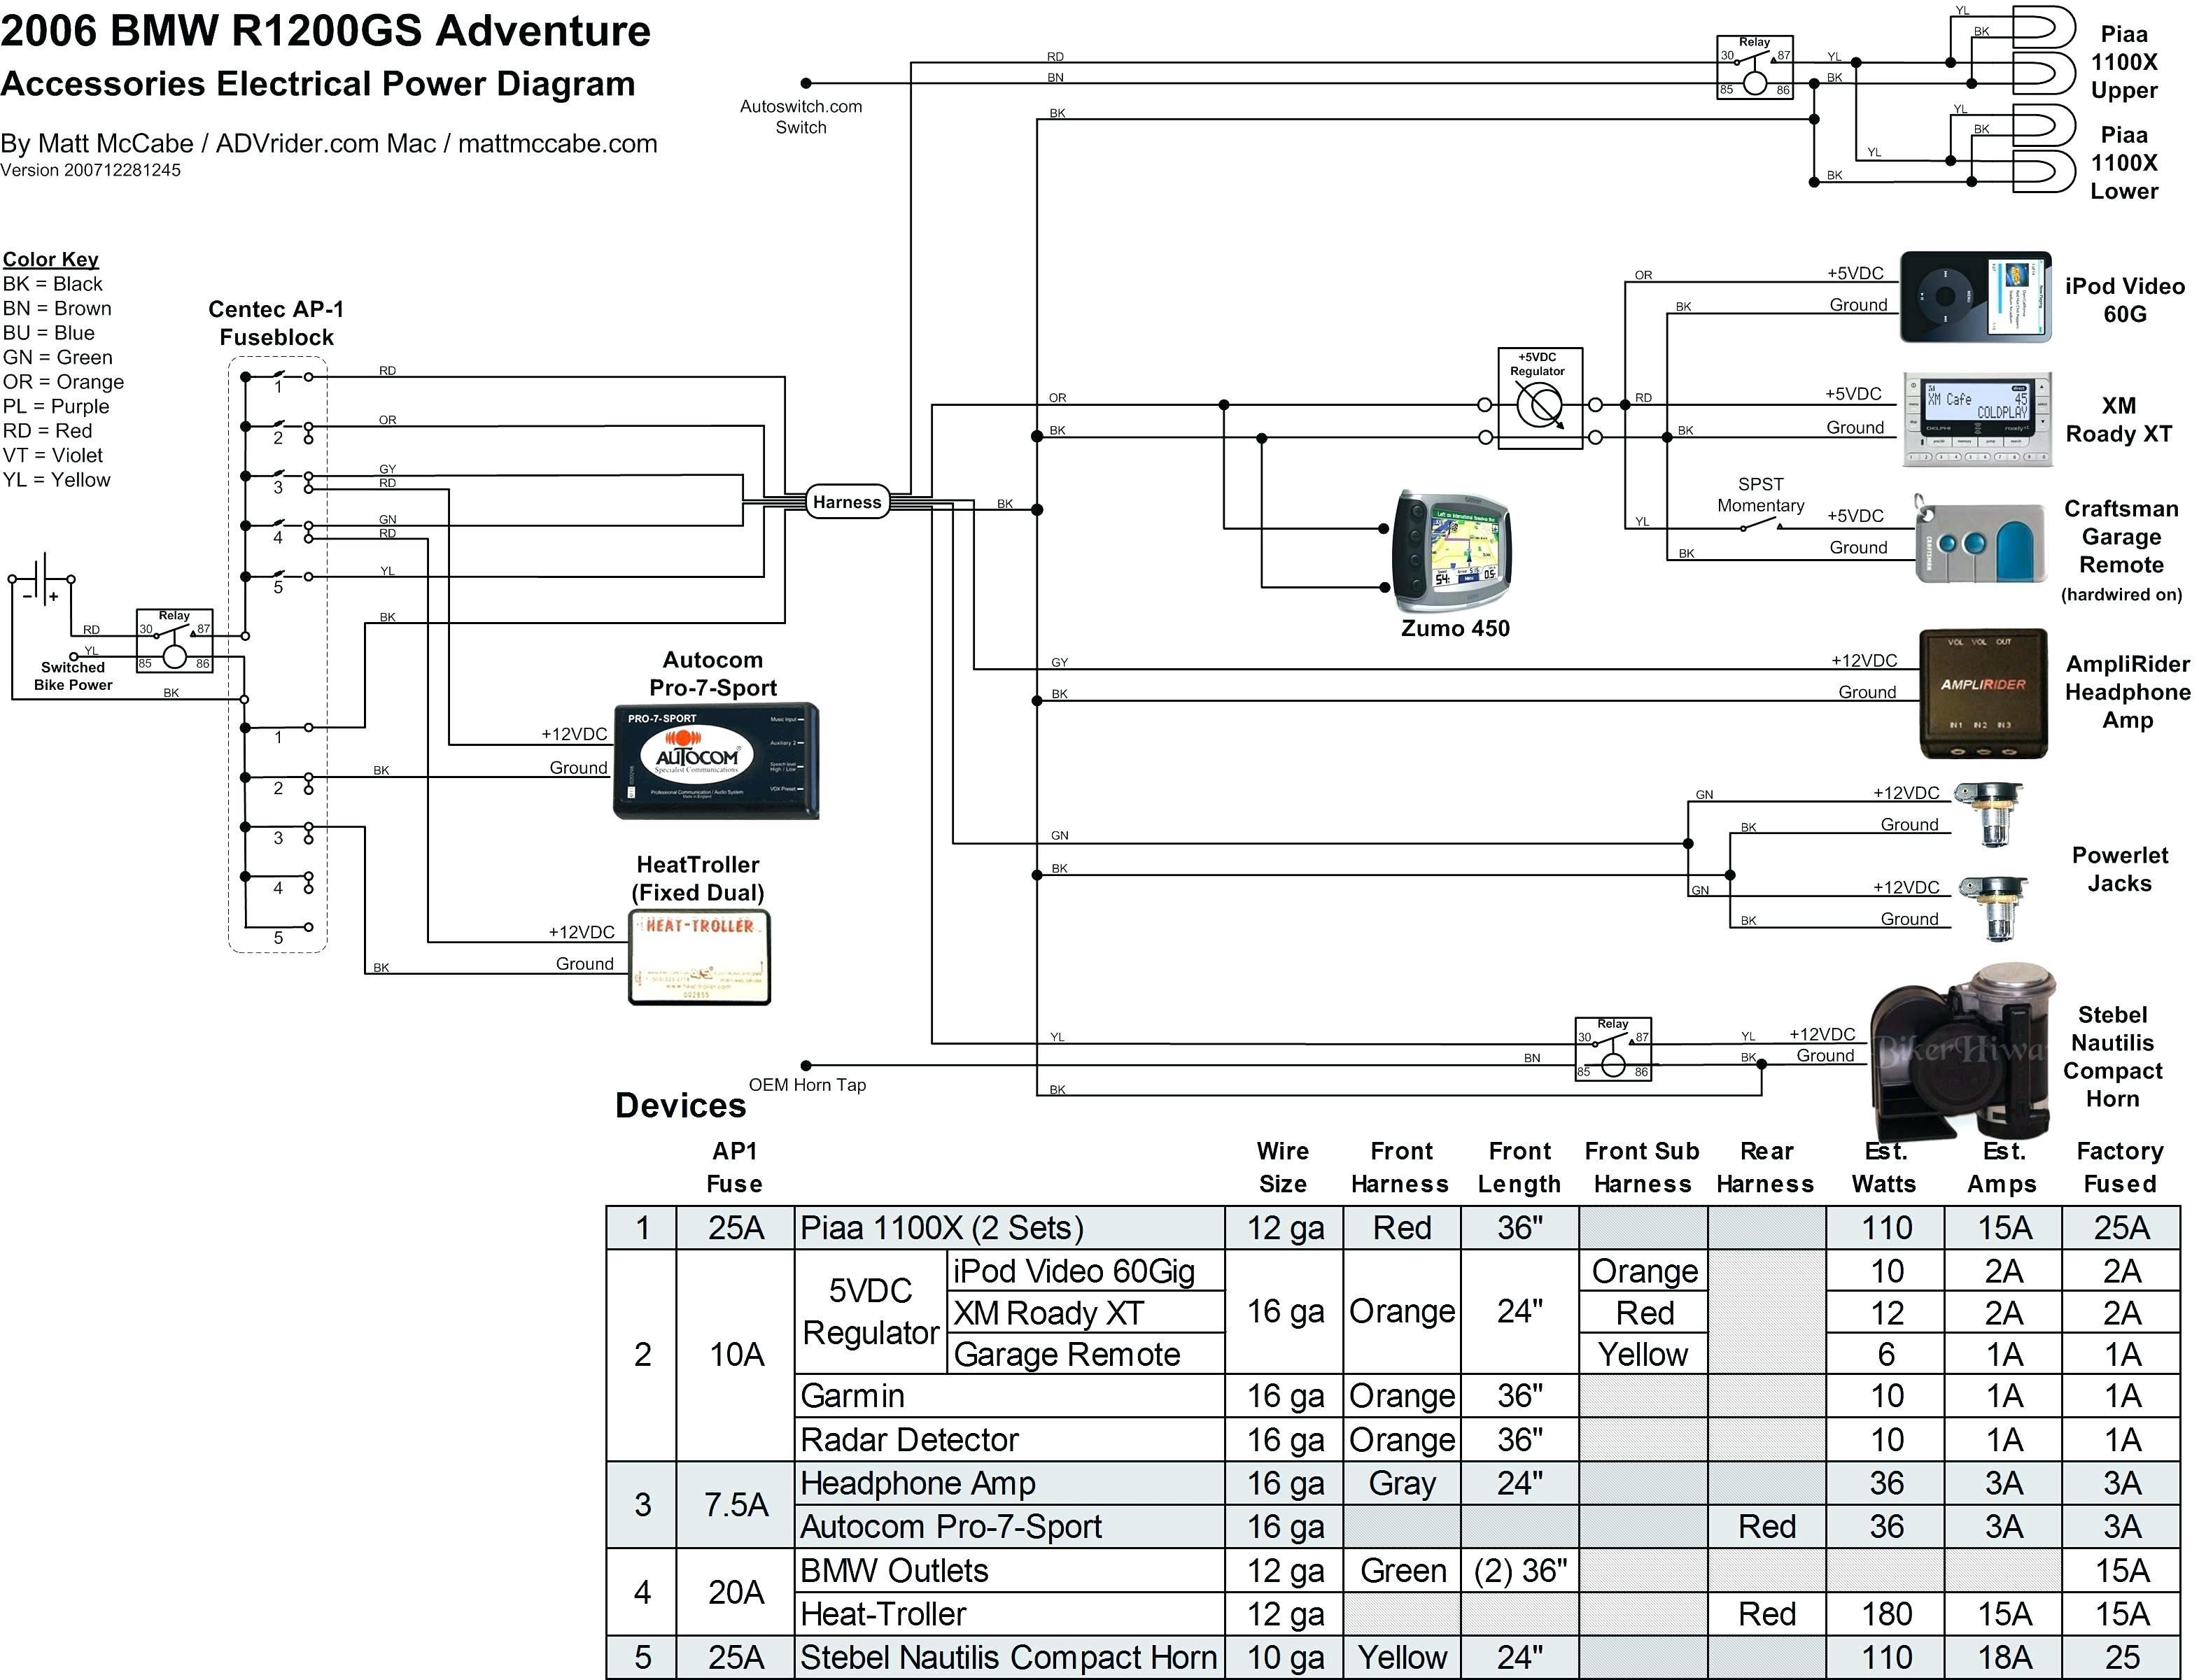 Electrical Wiring Diagram software Mac Fresh Wiring Diagram Program Fresh Best 25 Eagle Pcb Ideas Pinterest